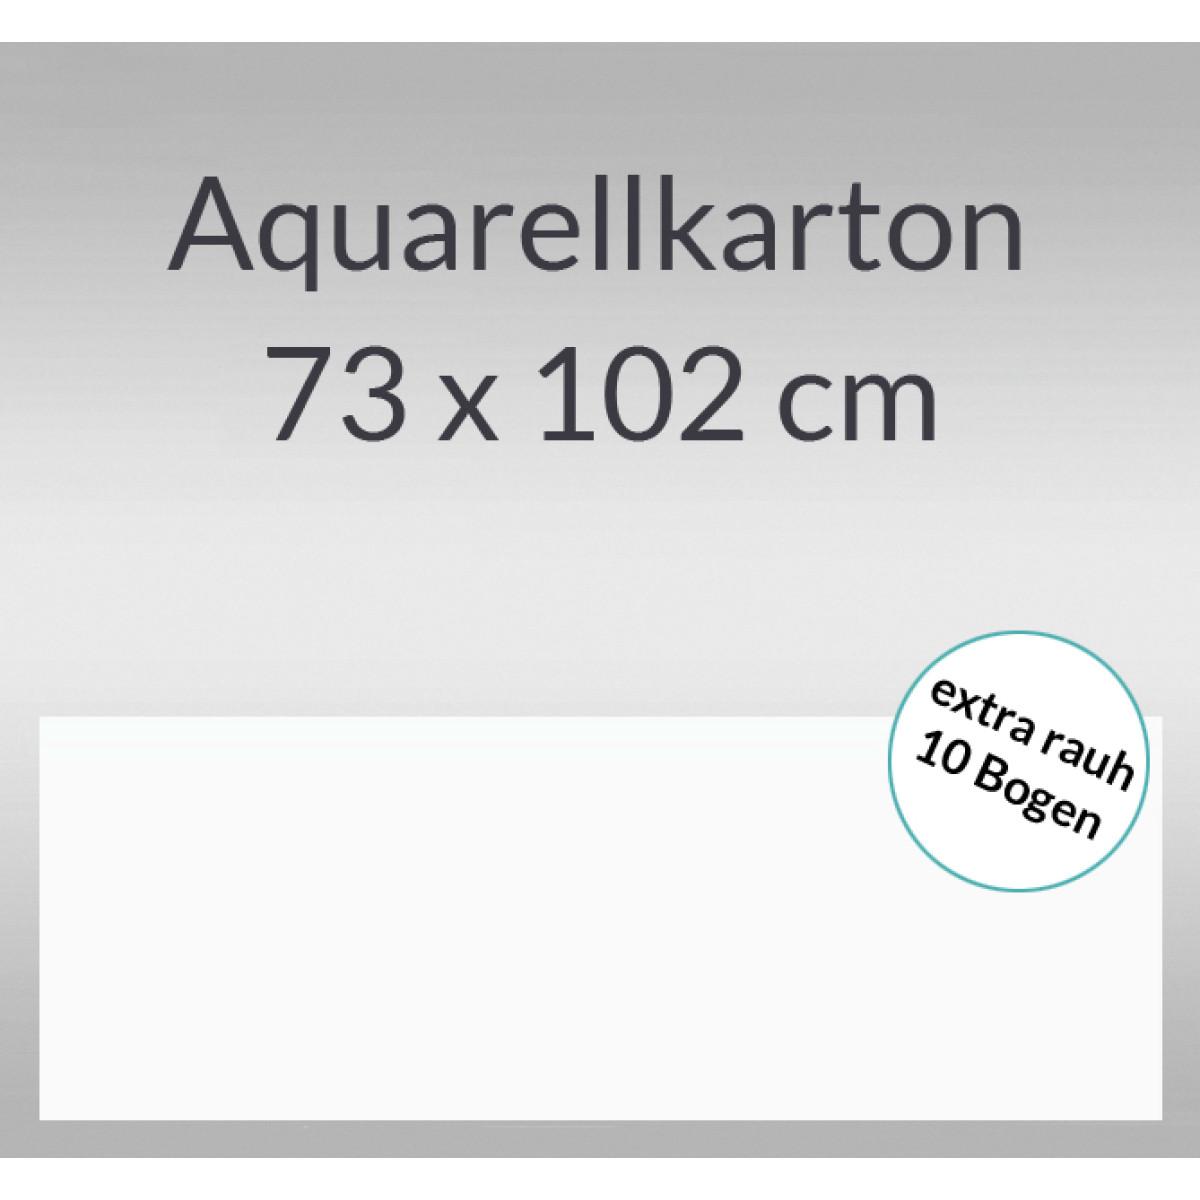 Aquarellkarton extra rauh 250 g/qm 73 x 102 cm